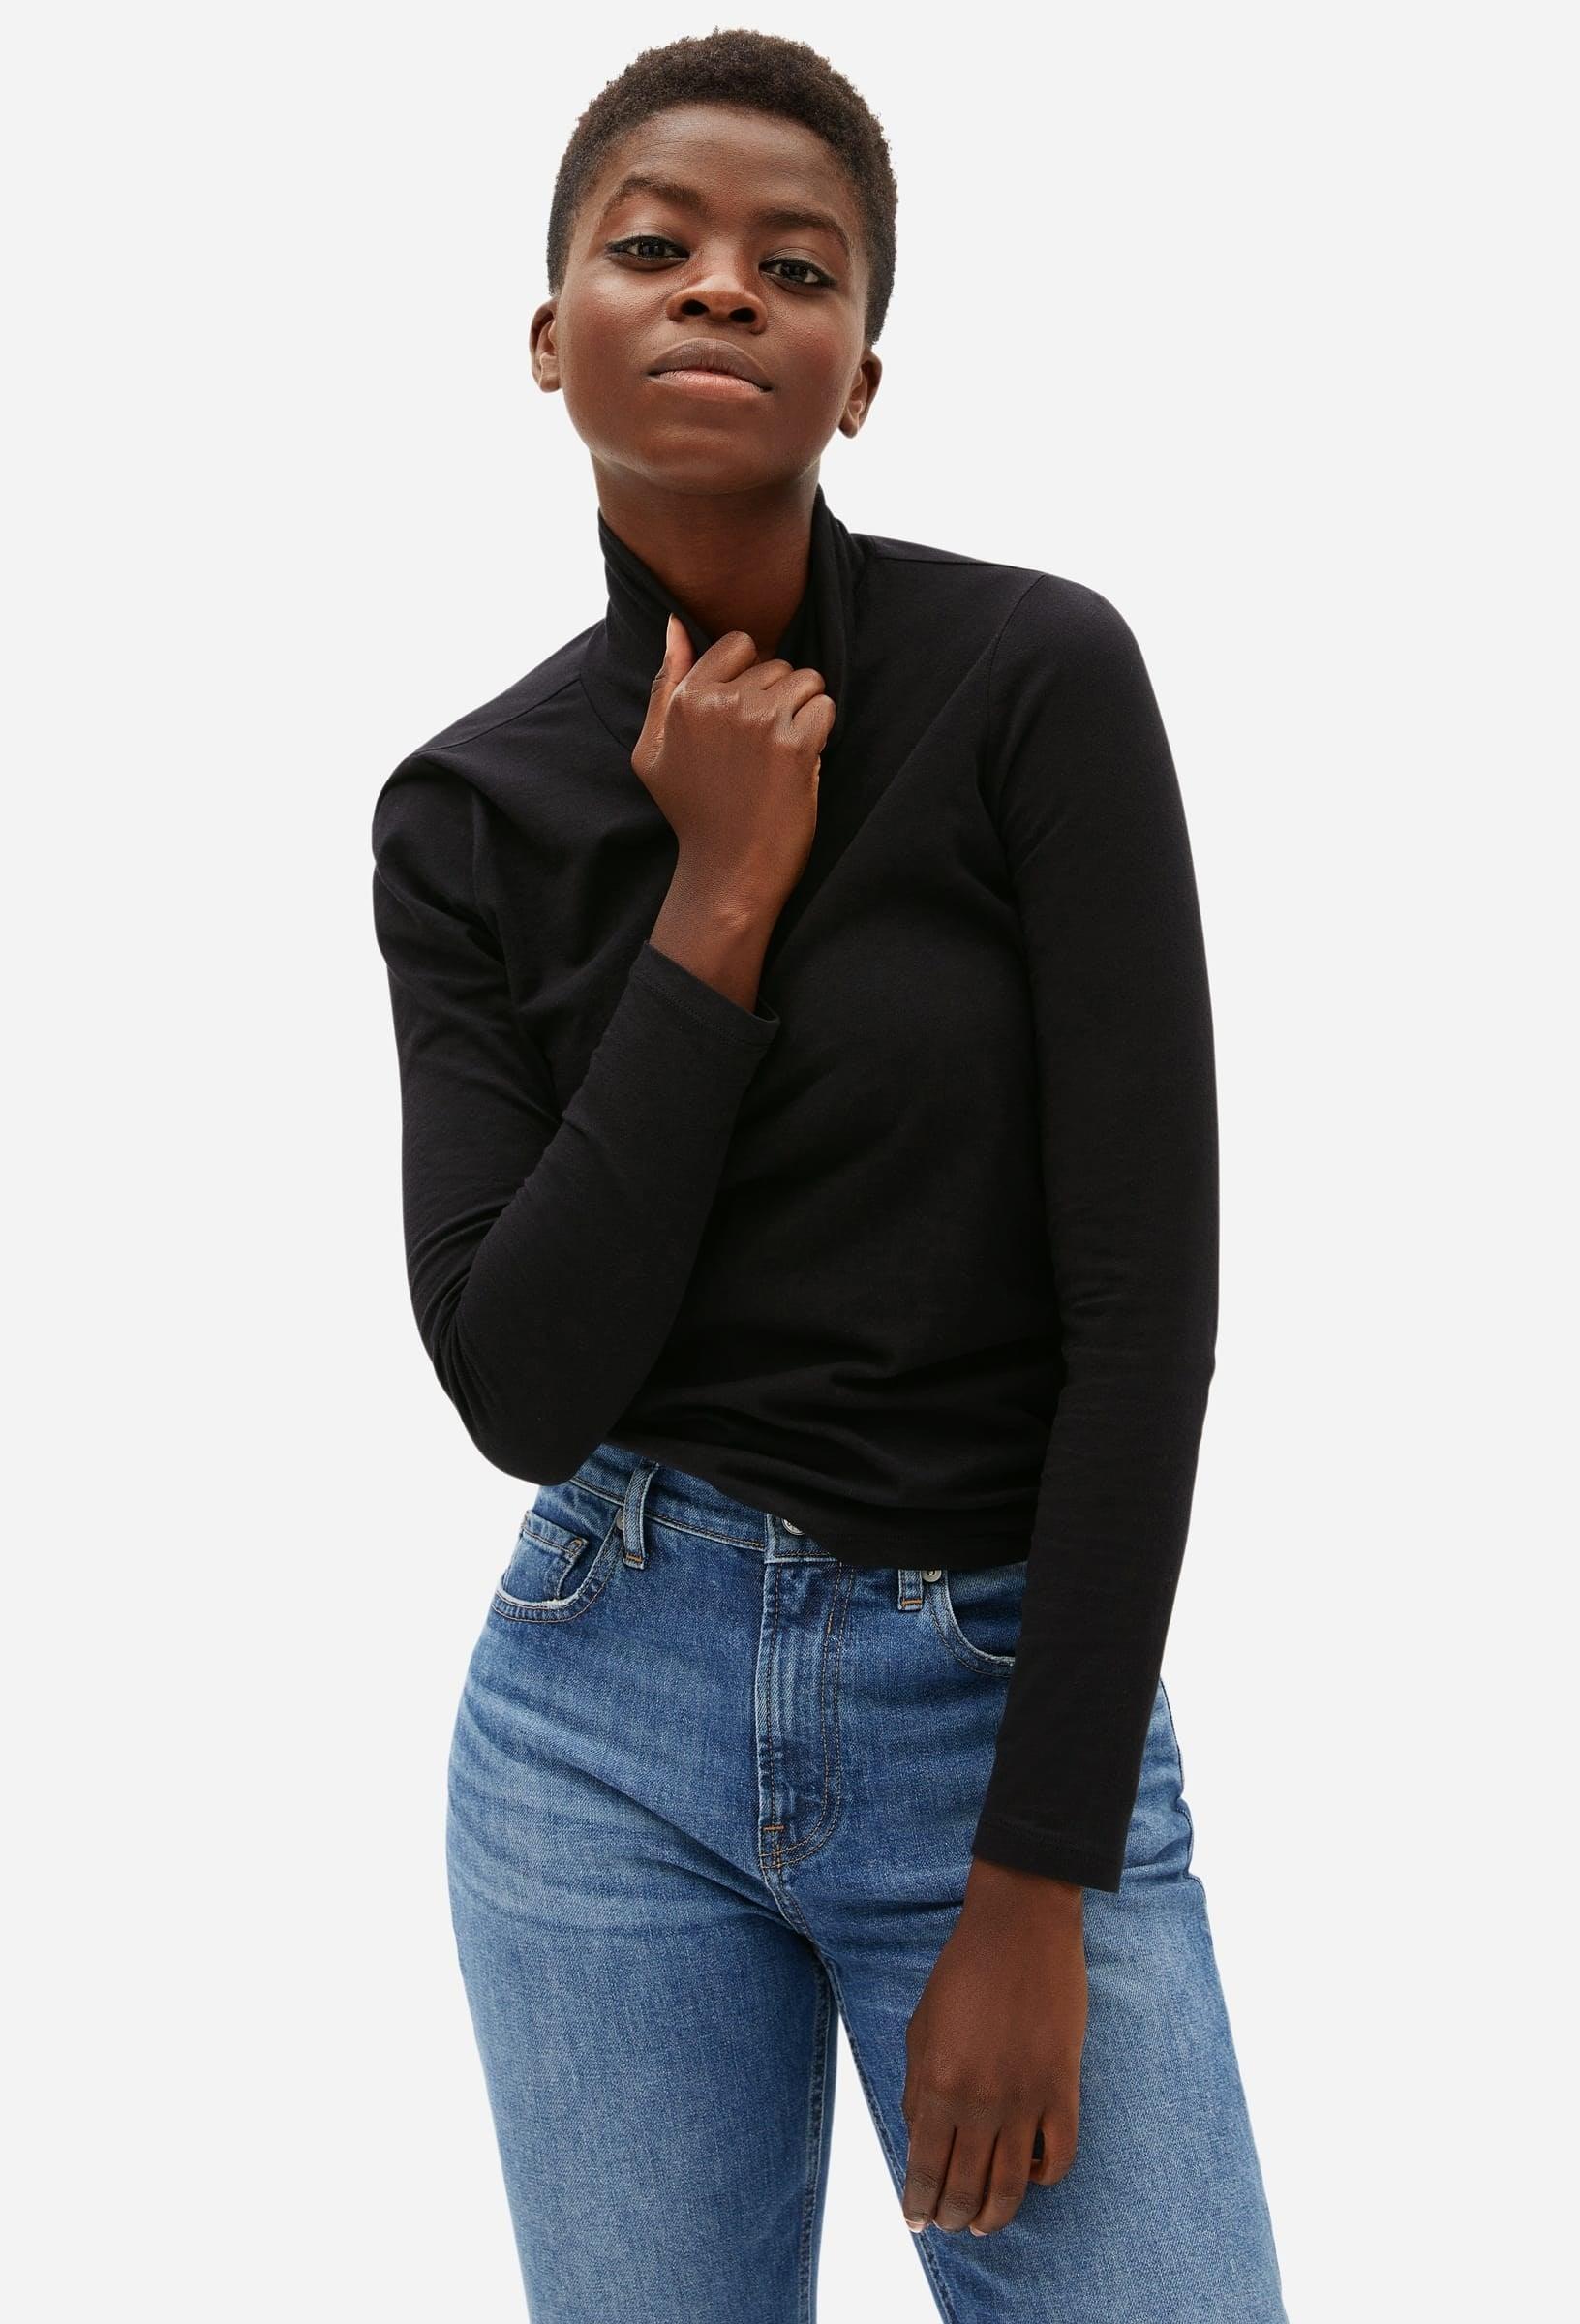 Model wearing the turtleneck